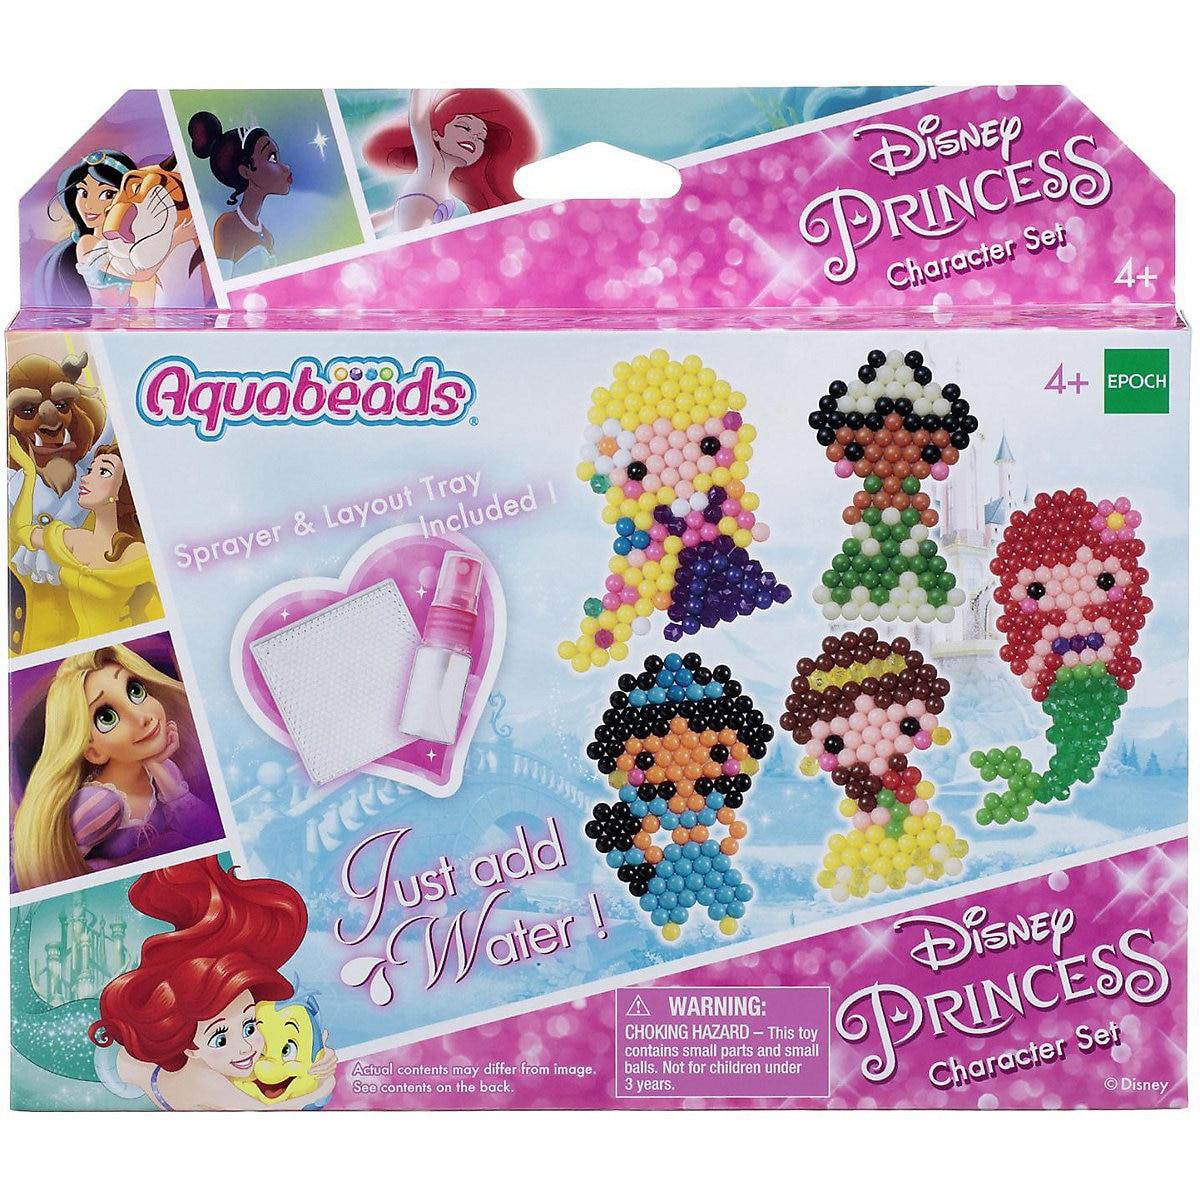 Aquabeads Beads Toys 10134714 Creativity Needlework For Children Set Kids Toy Hobbis Arts Crafts DIY MTpromo